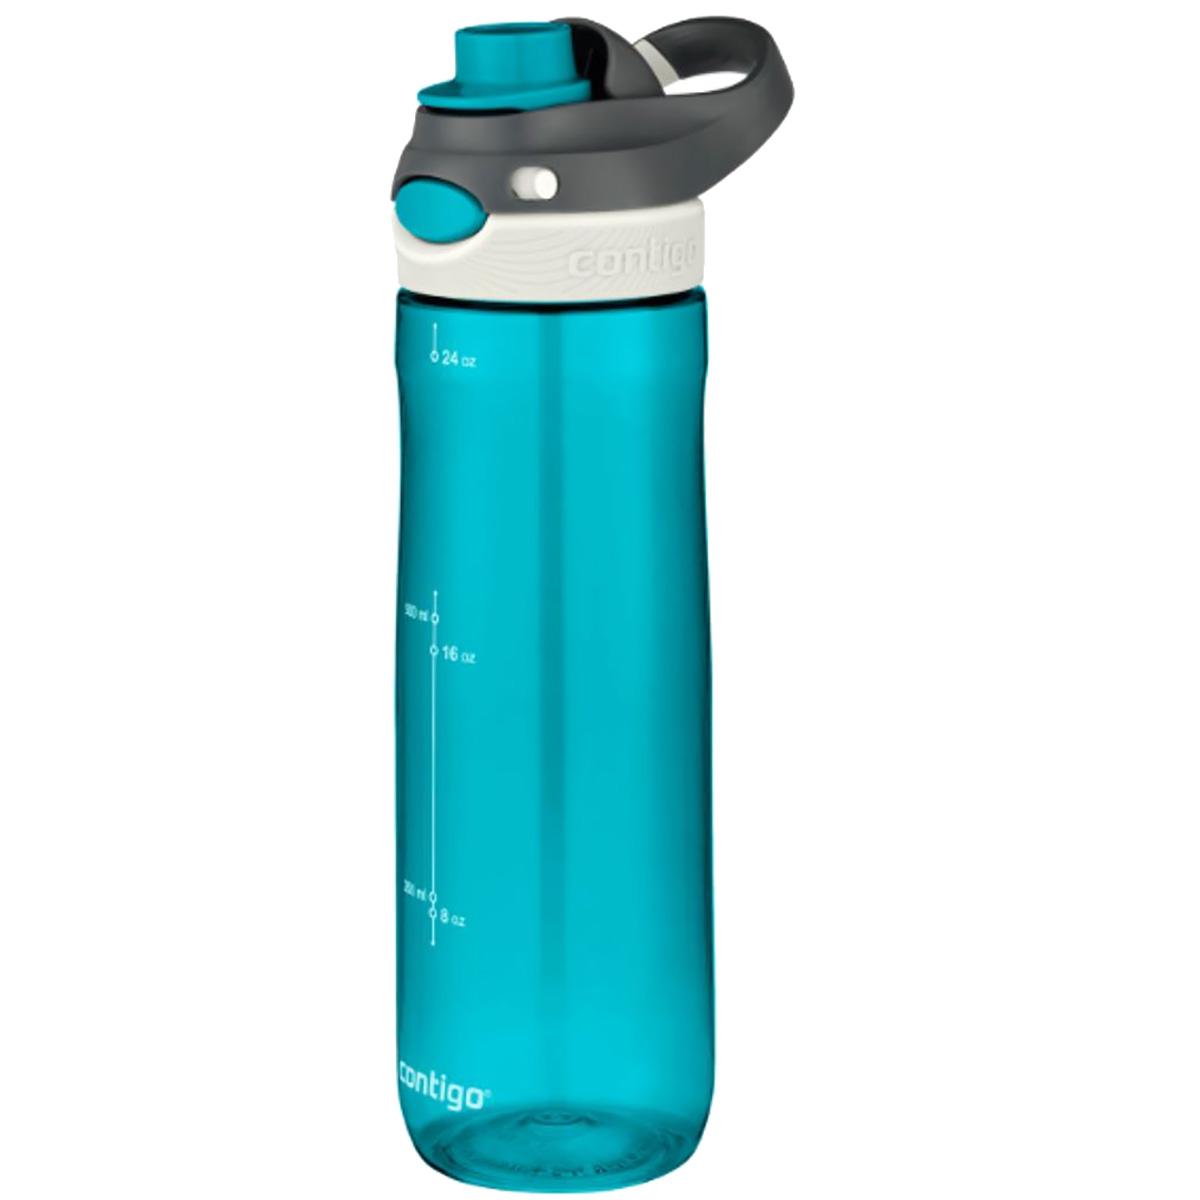 Contigo-24-oz-Chug-Autospout-Leak-Proof-Water-Bottle miniatuur 17